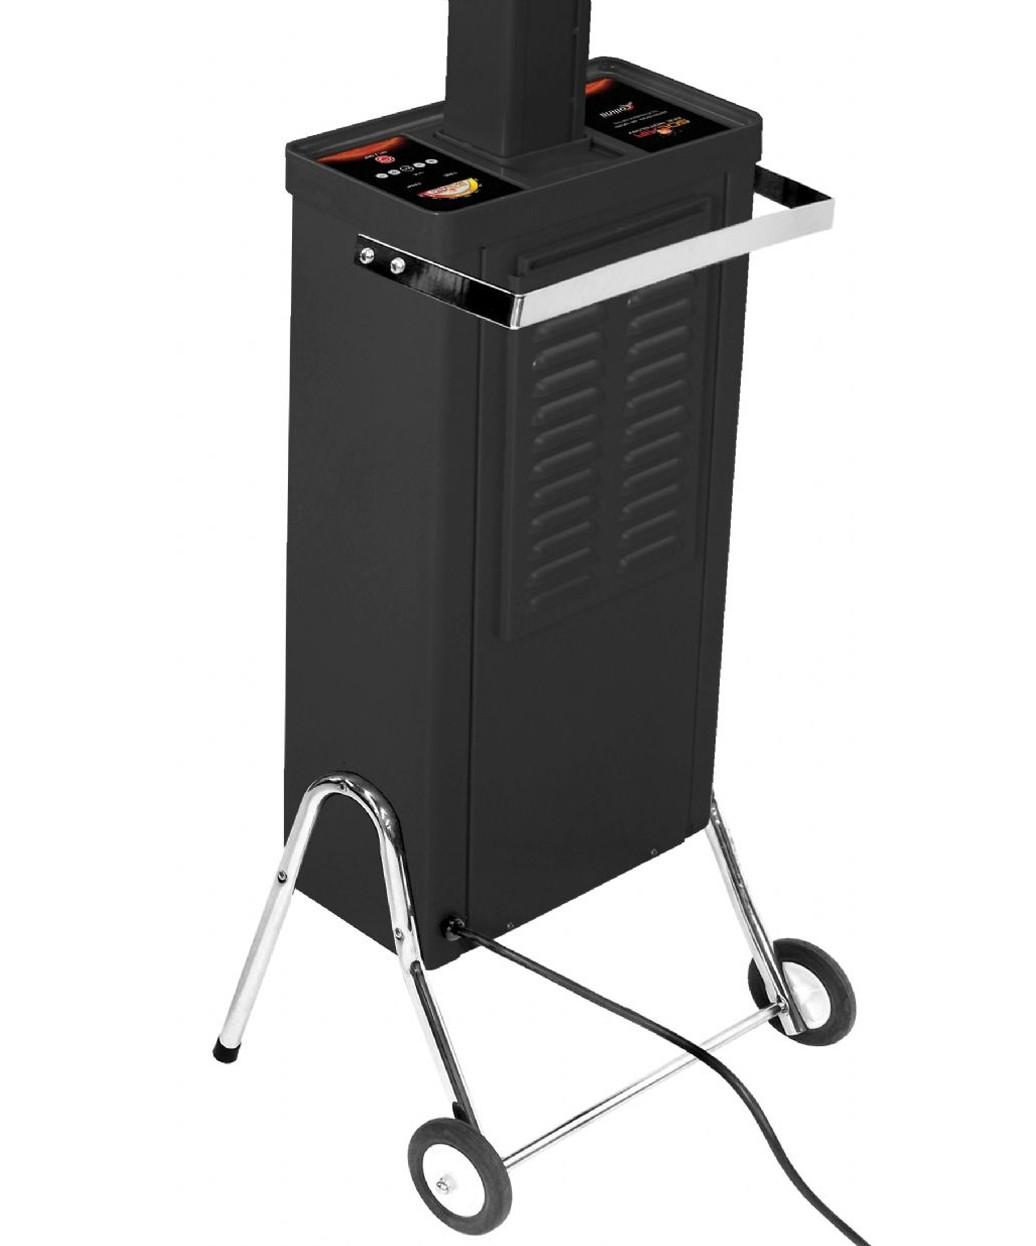 Collins QSE WA-300 Dryer Wheel & Handle Set